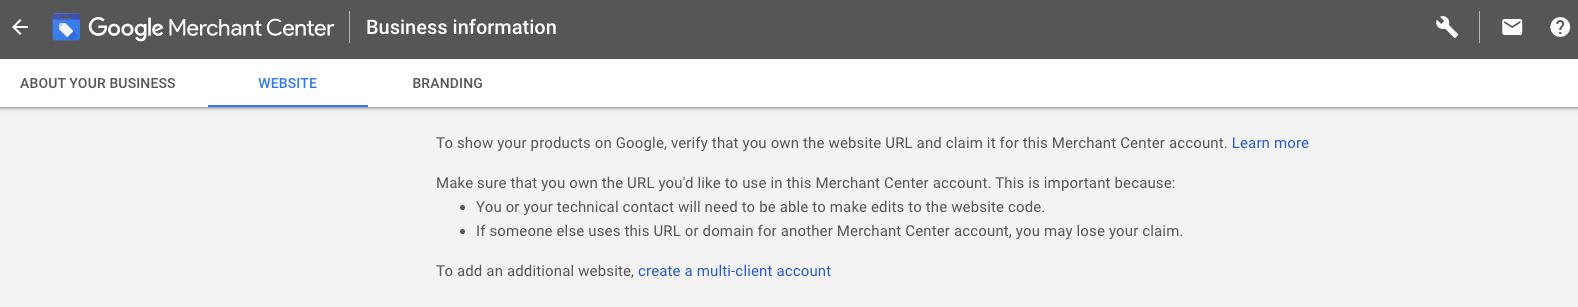 Google Merchant Center verification